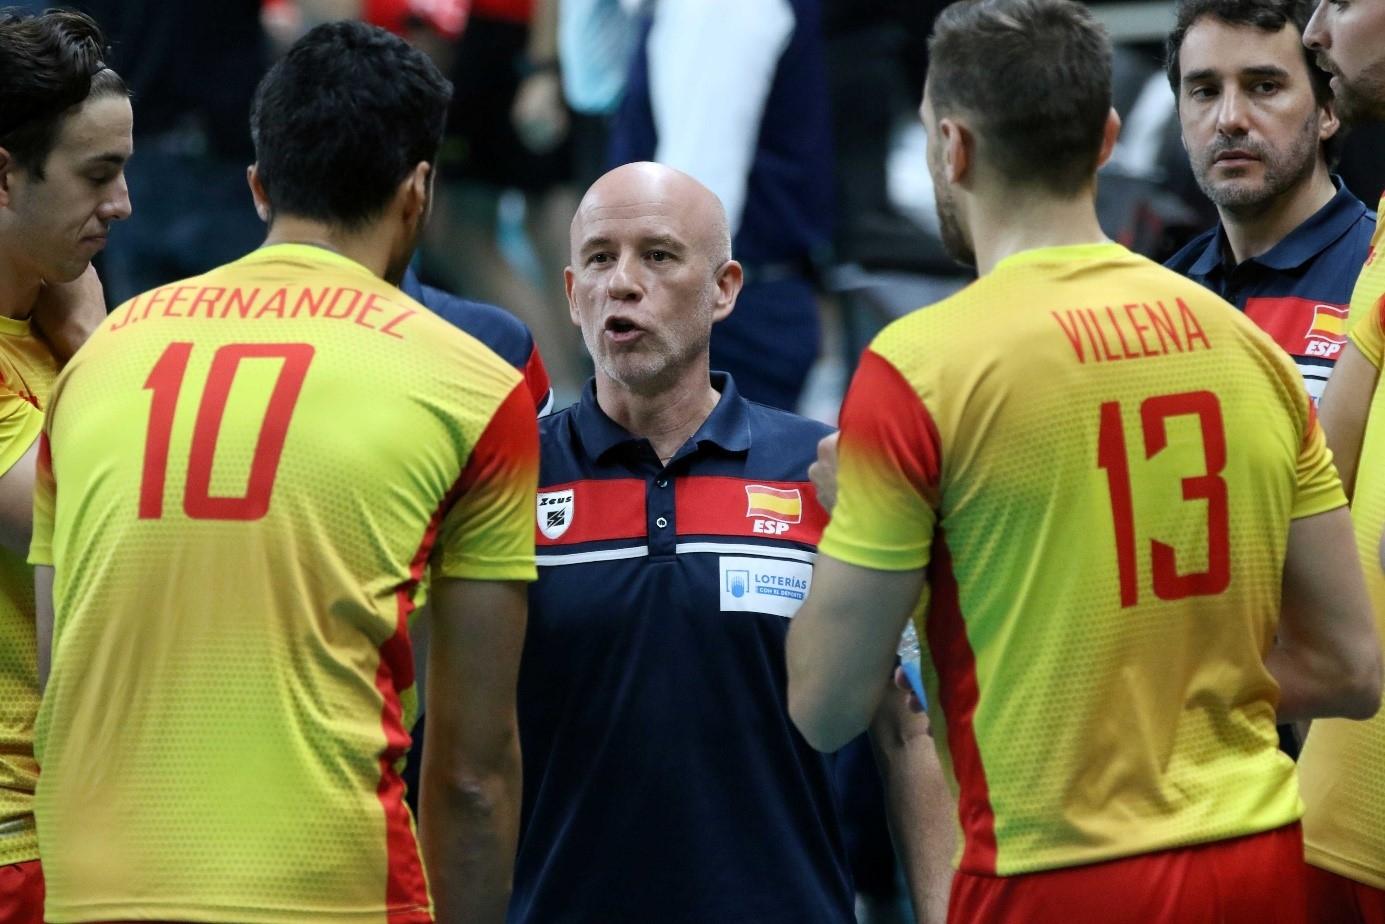 Испанецът Фернандо Муньос поема поста старши-треньор на мъжкия национален отбор